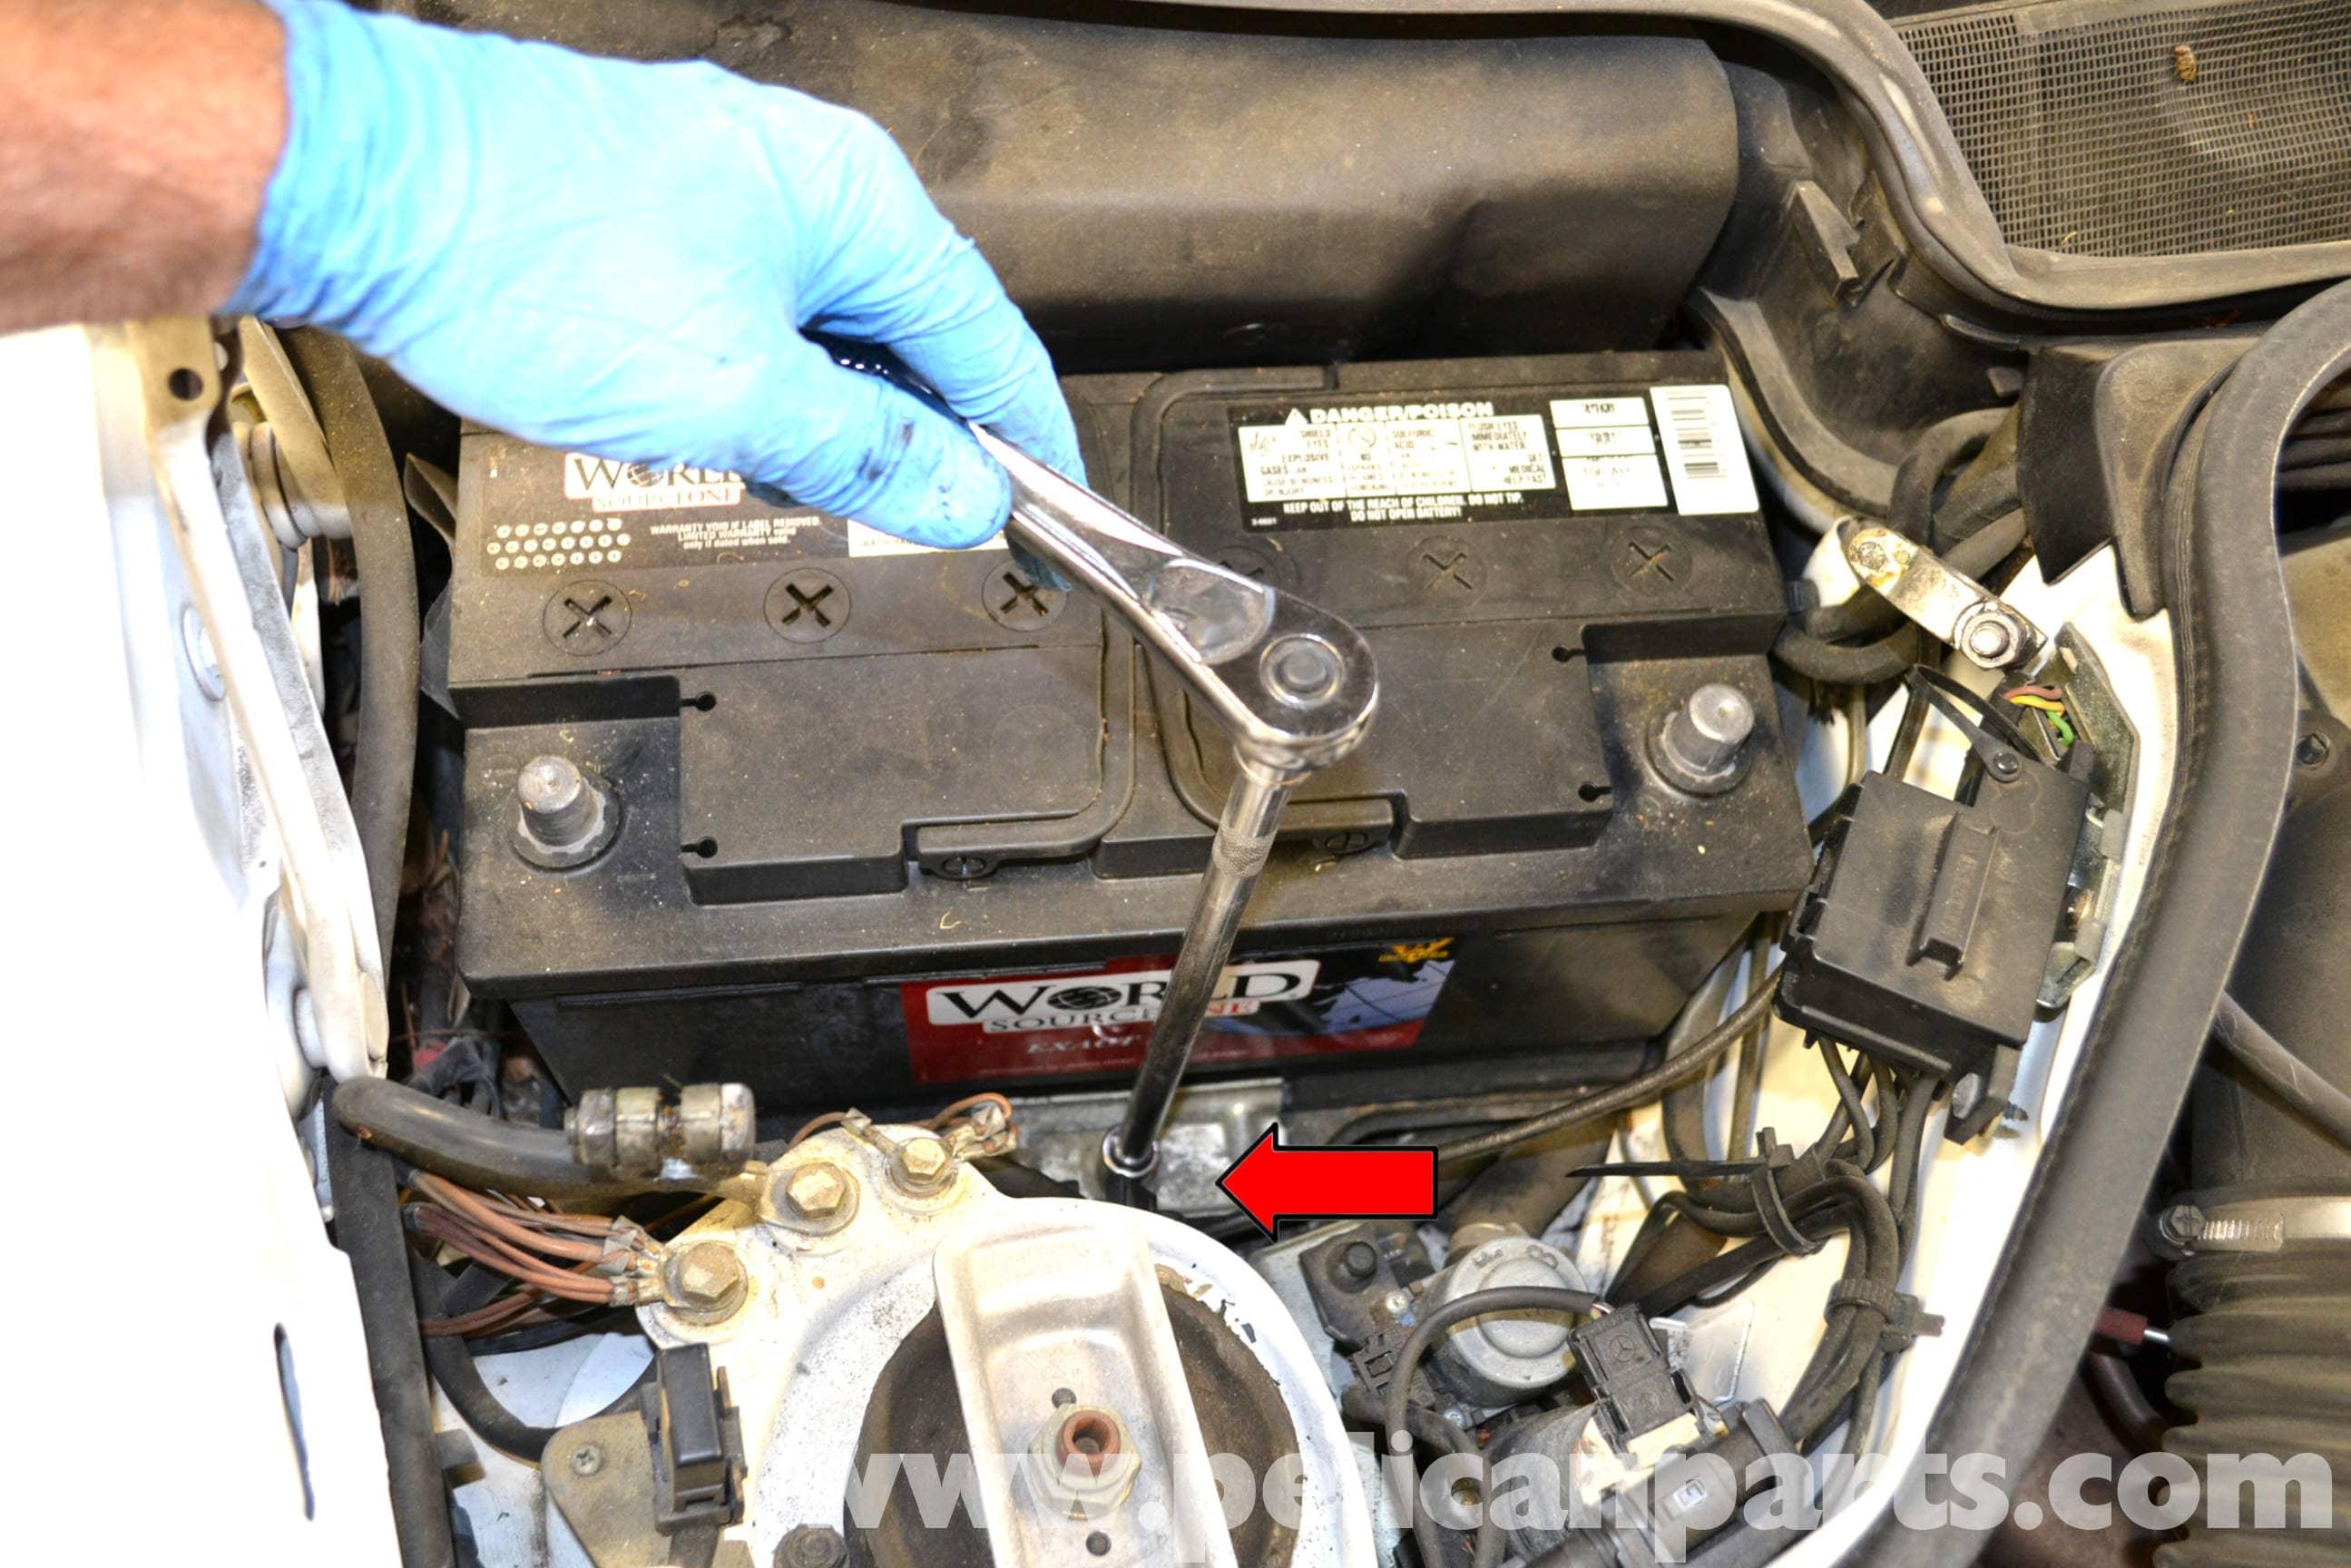 Basics To Wiring A Car